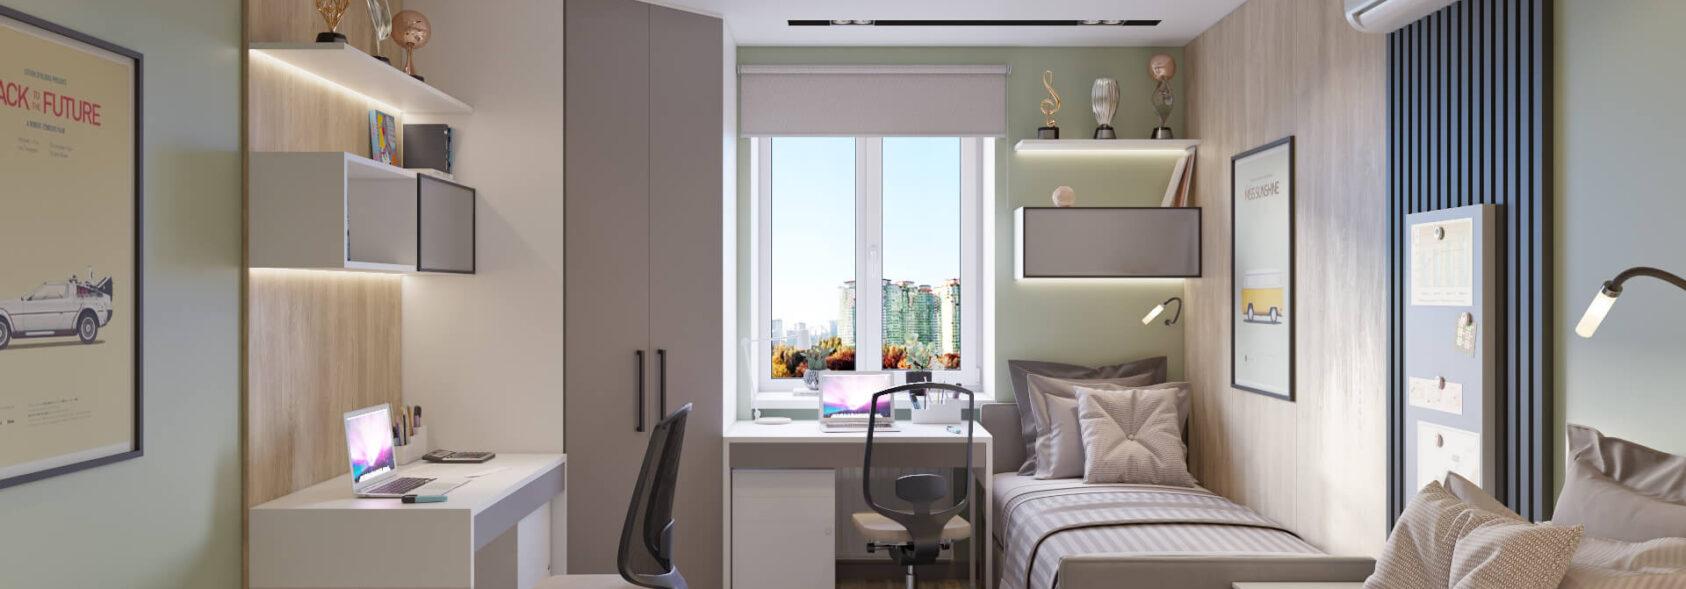 Детская дизайн 3х комнатной квартиры Днепр